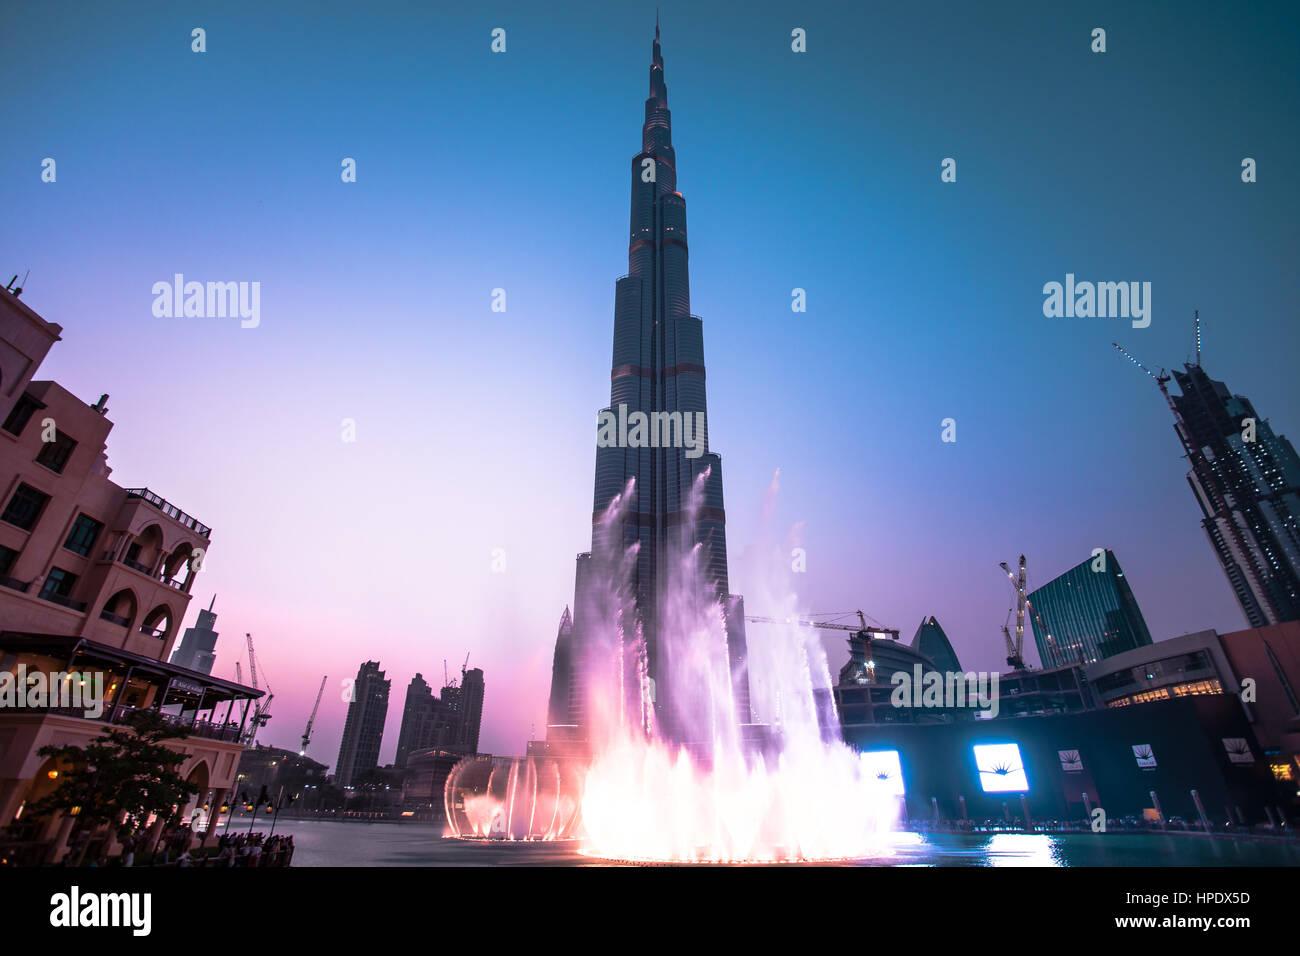 Los impresionantes rascacielos Burj Khalifa Imagen De Stock